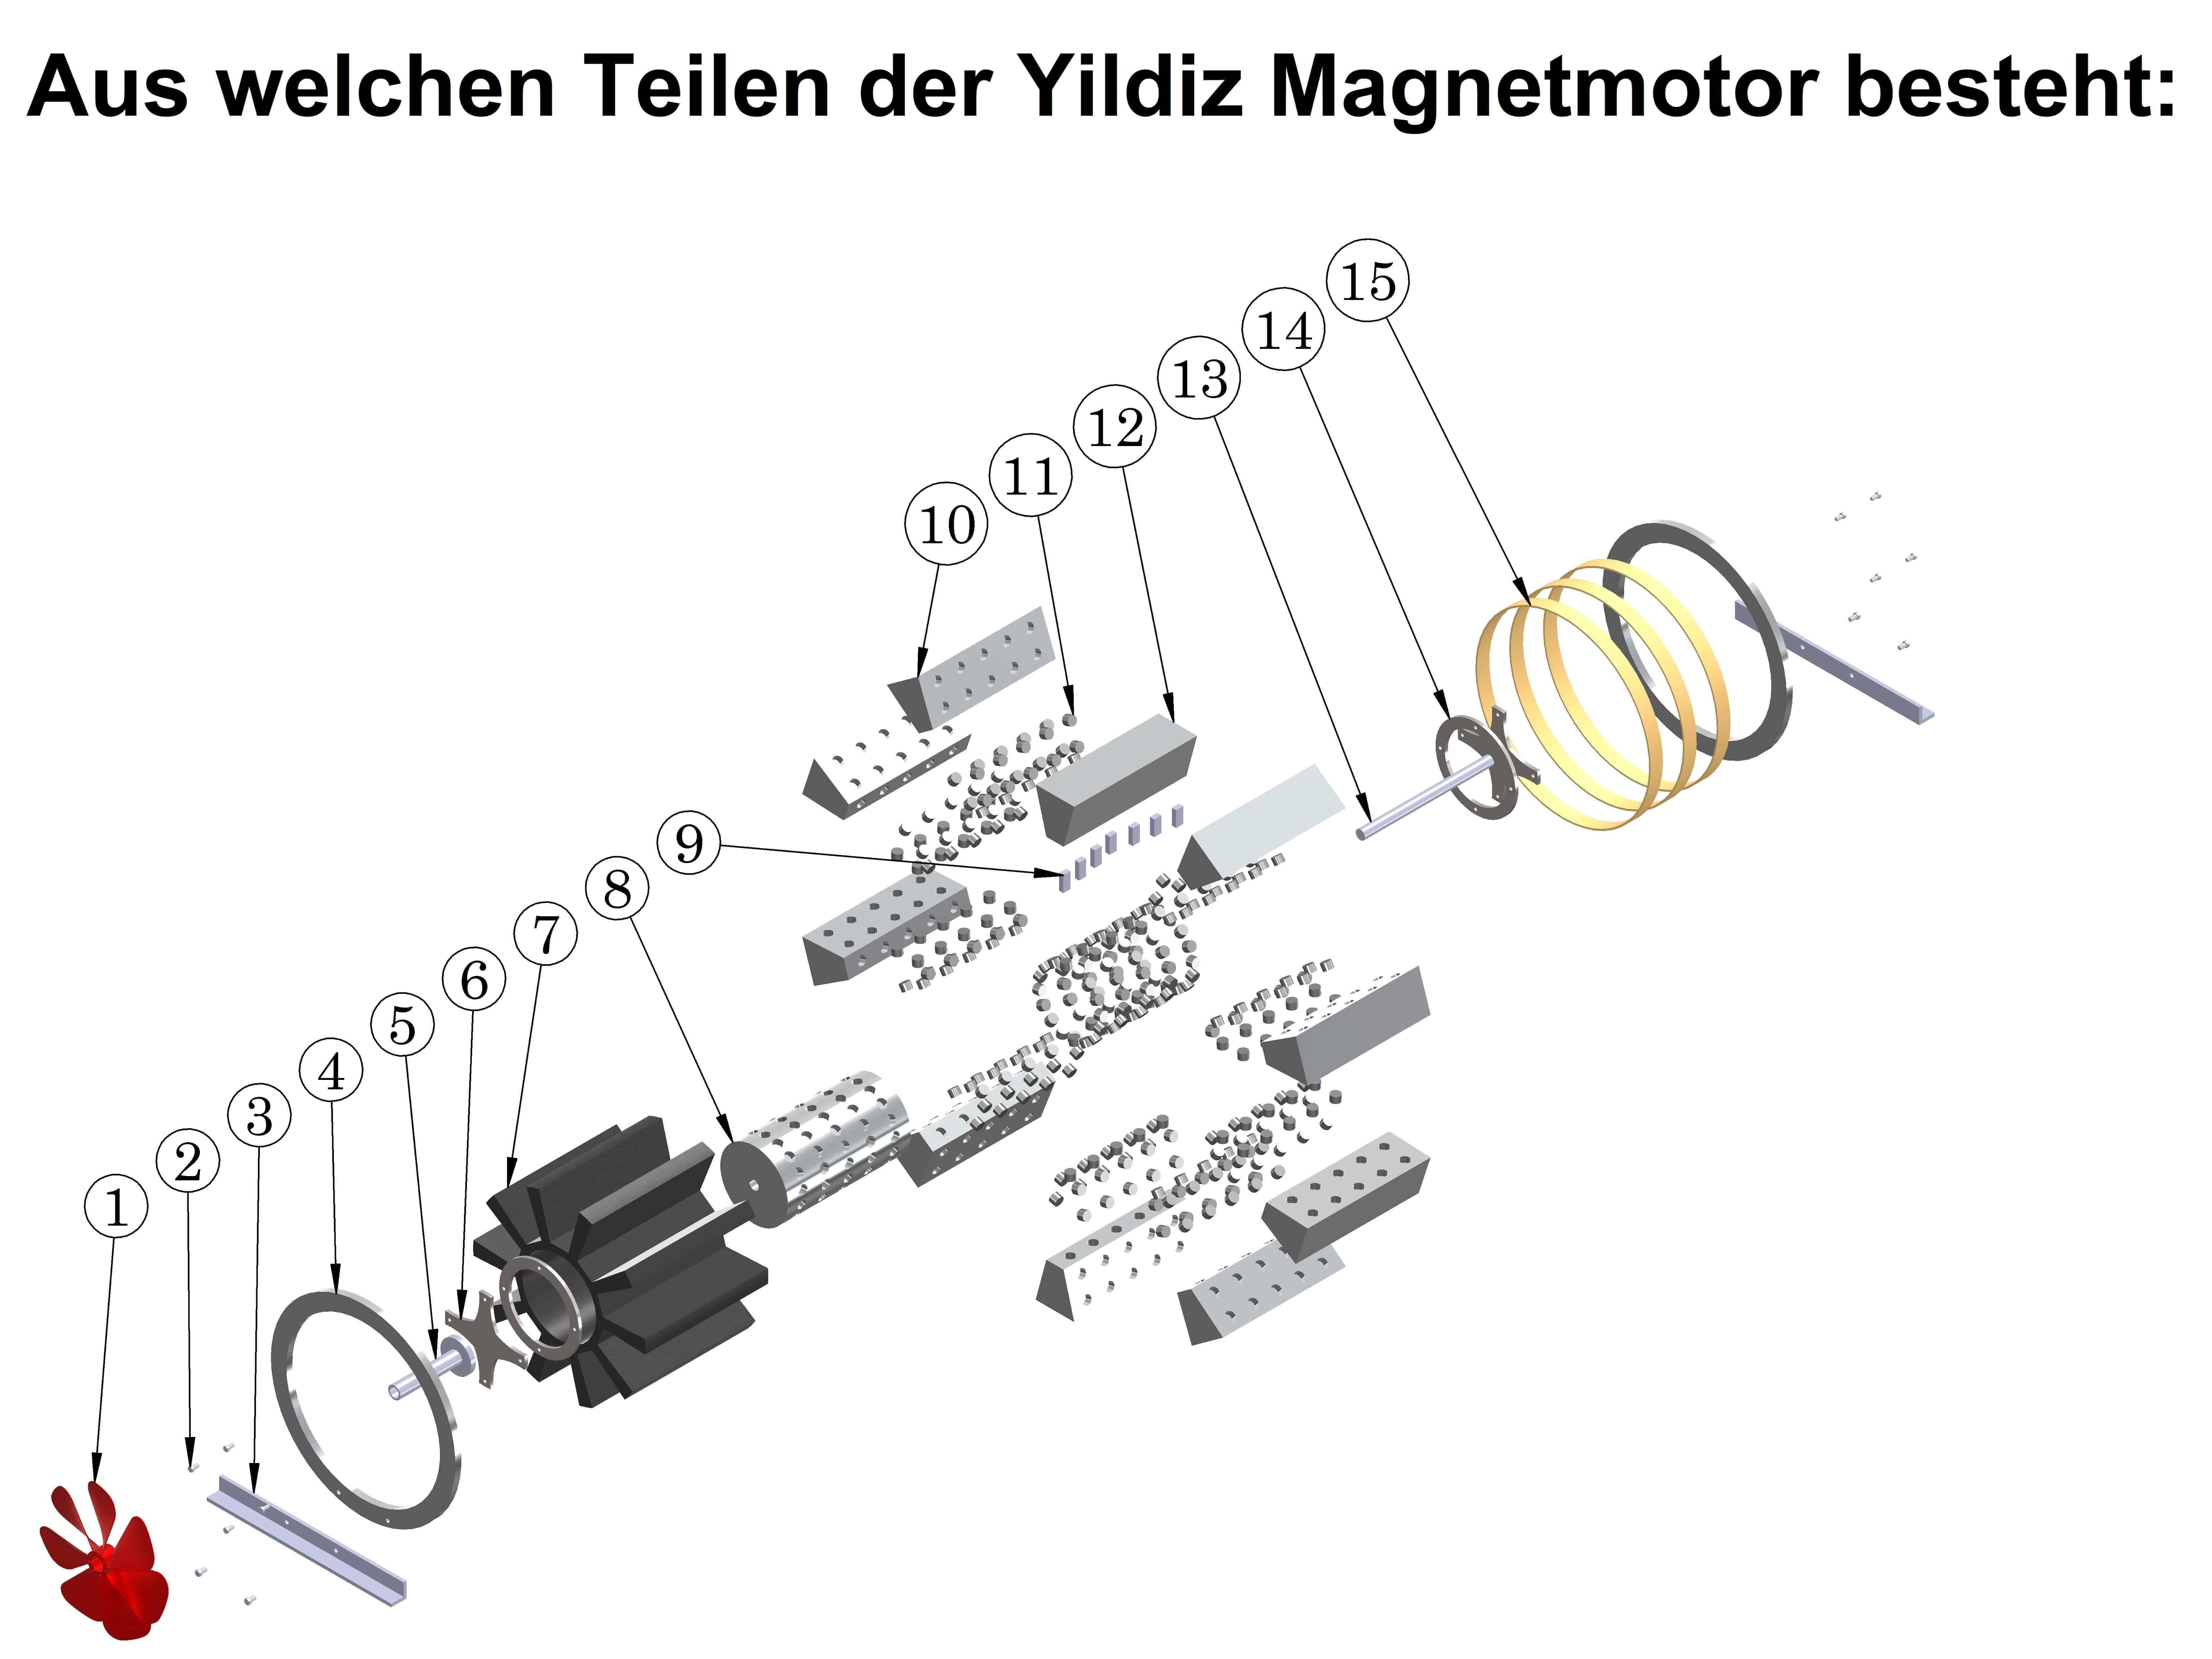 Details Zu Magnetmotor Freie Energie Selber Bauen Generator Perpetuum Mobile Permanent Neu